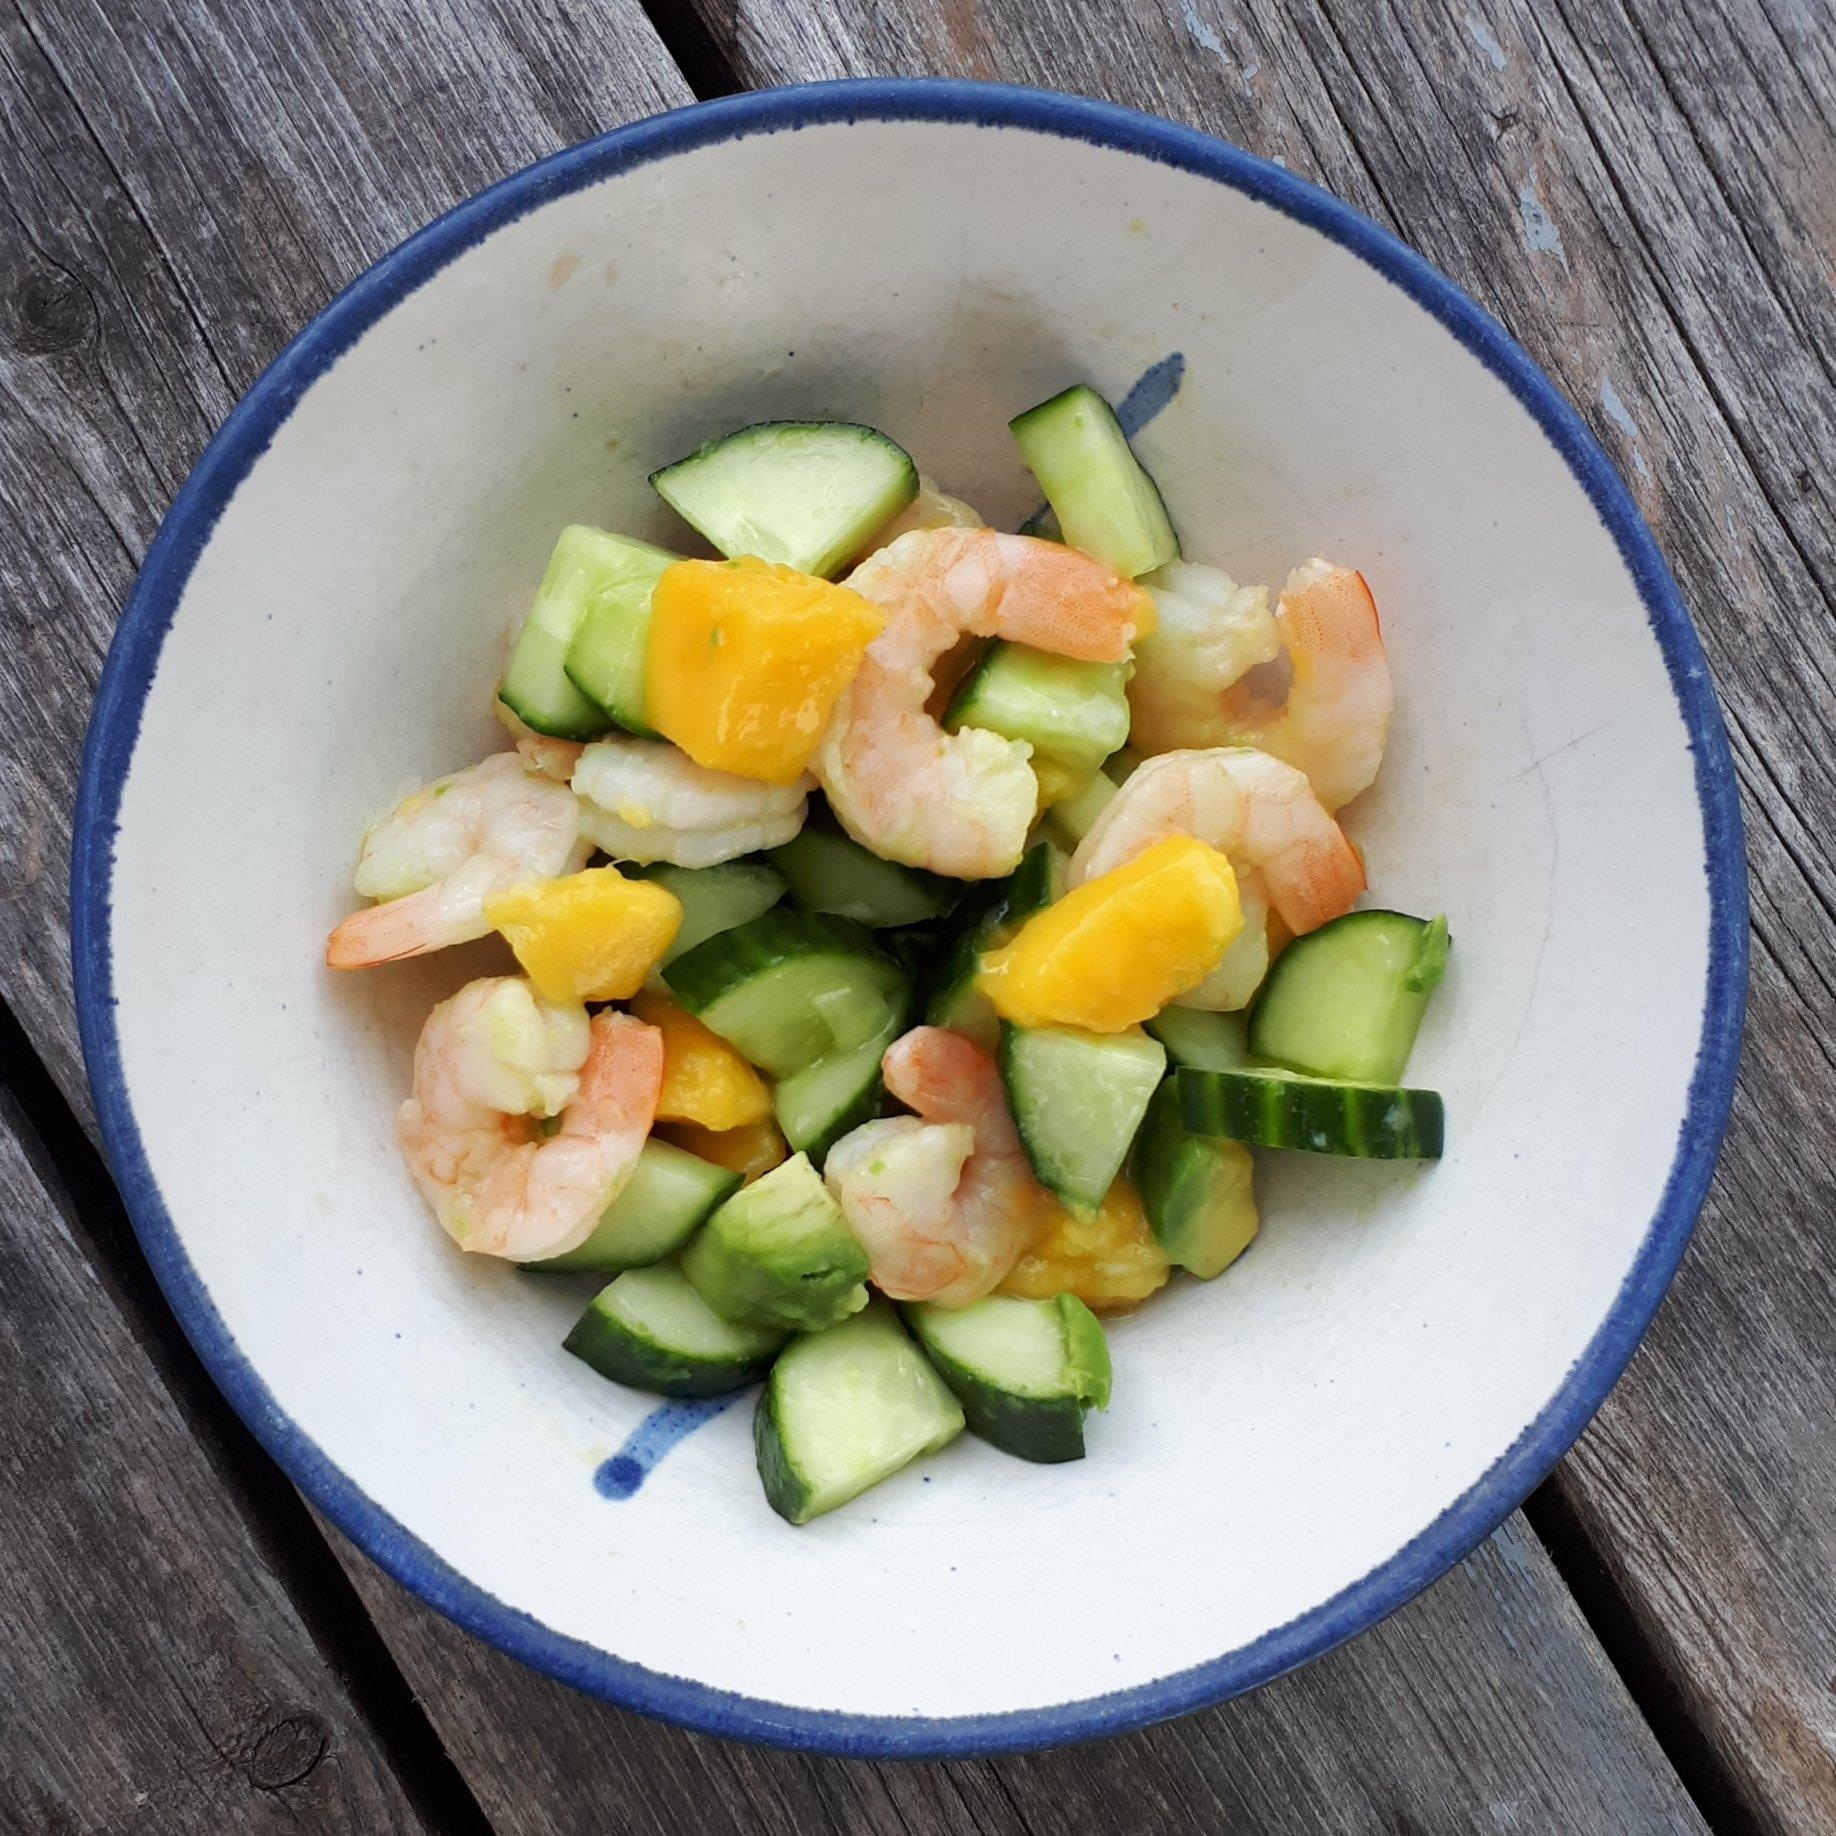 The Simple Shrimp, Mango & Avocado Summer Salad